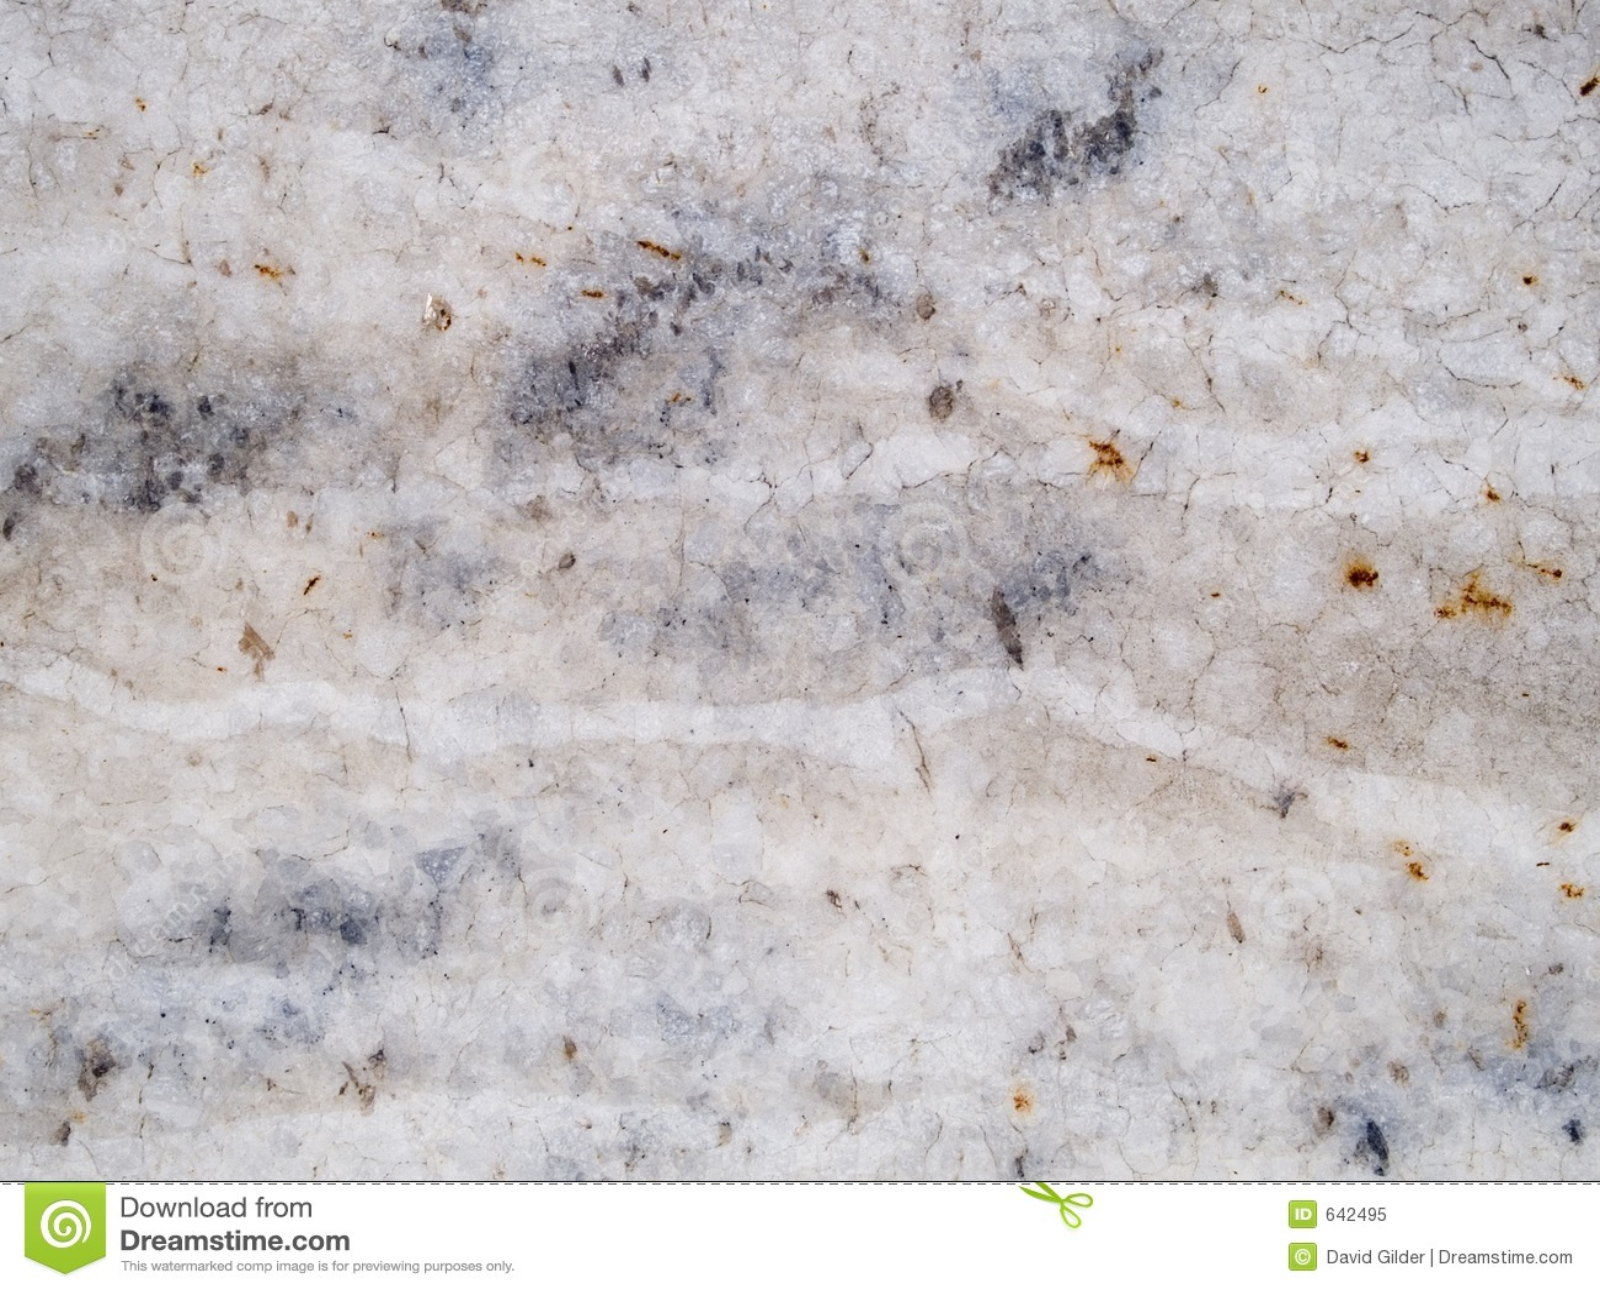 Textura macra piedra m rmol for Textura del marmol